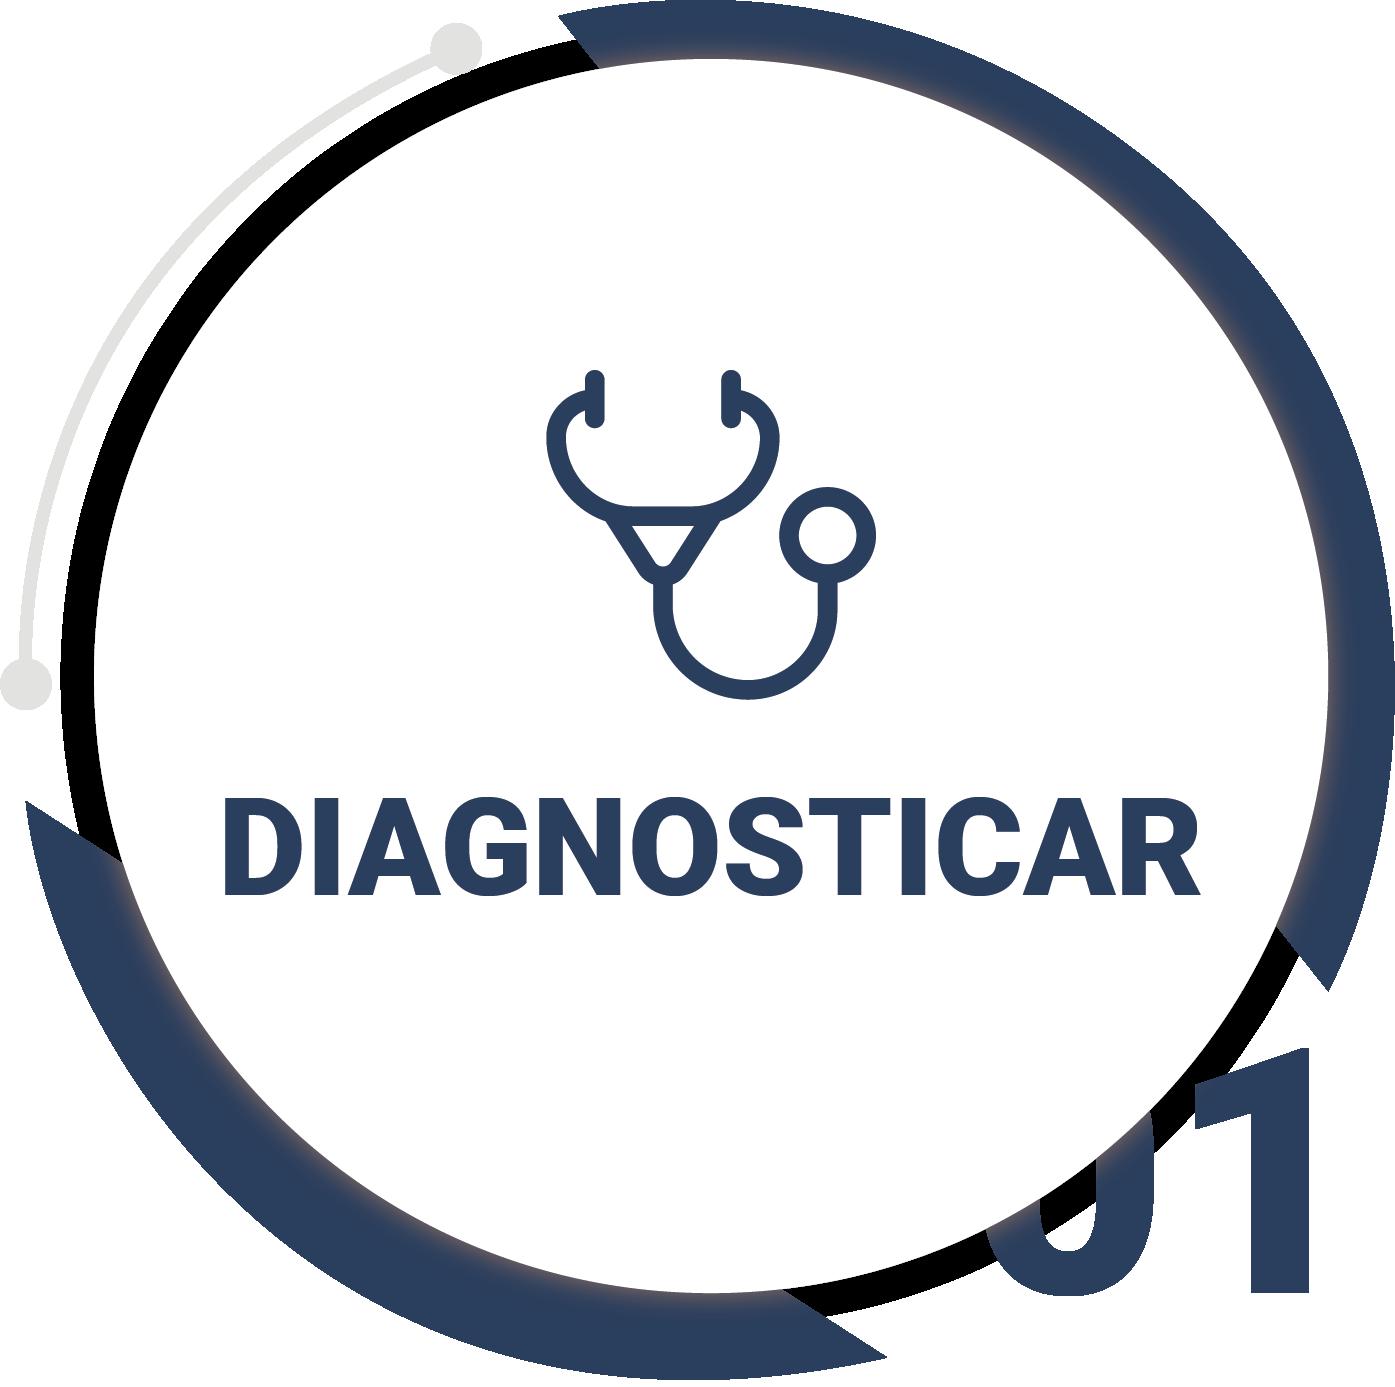 Diagnosticar - Ciberseguridad Verne Group